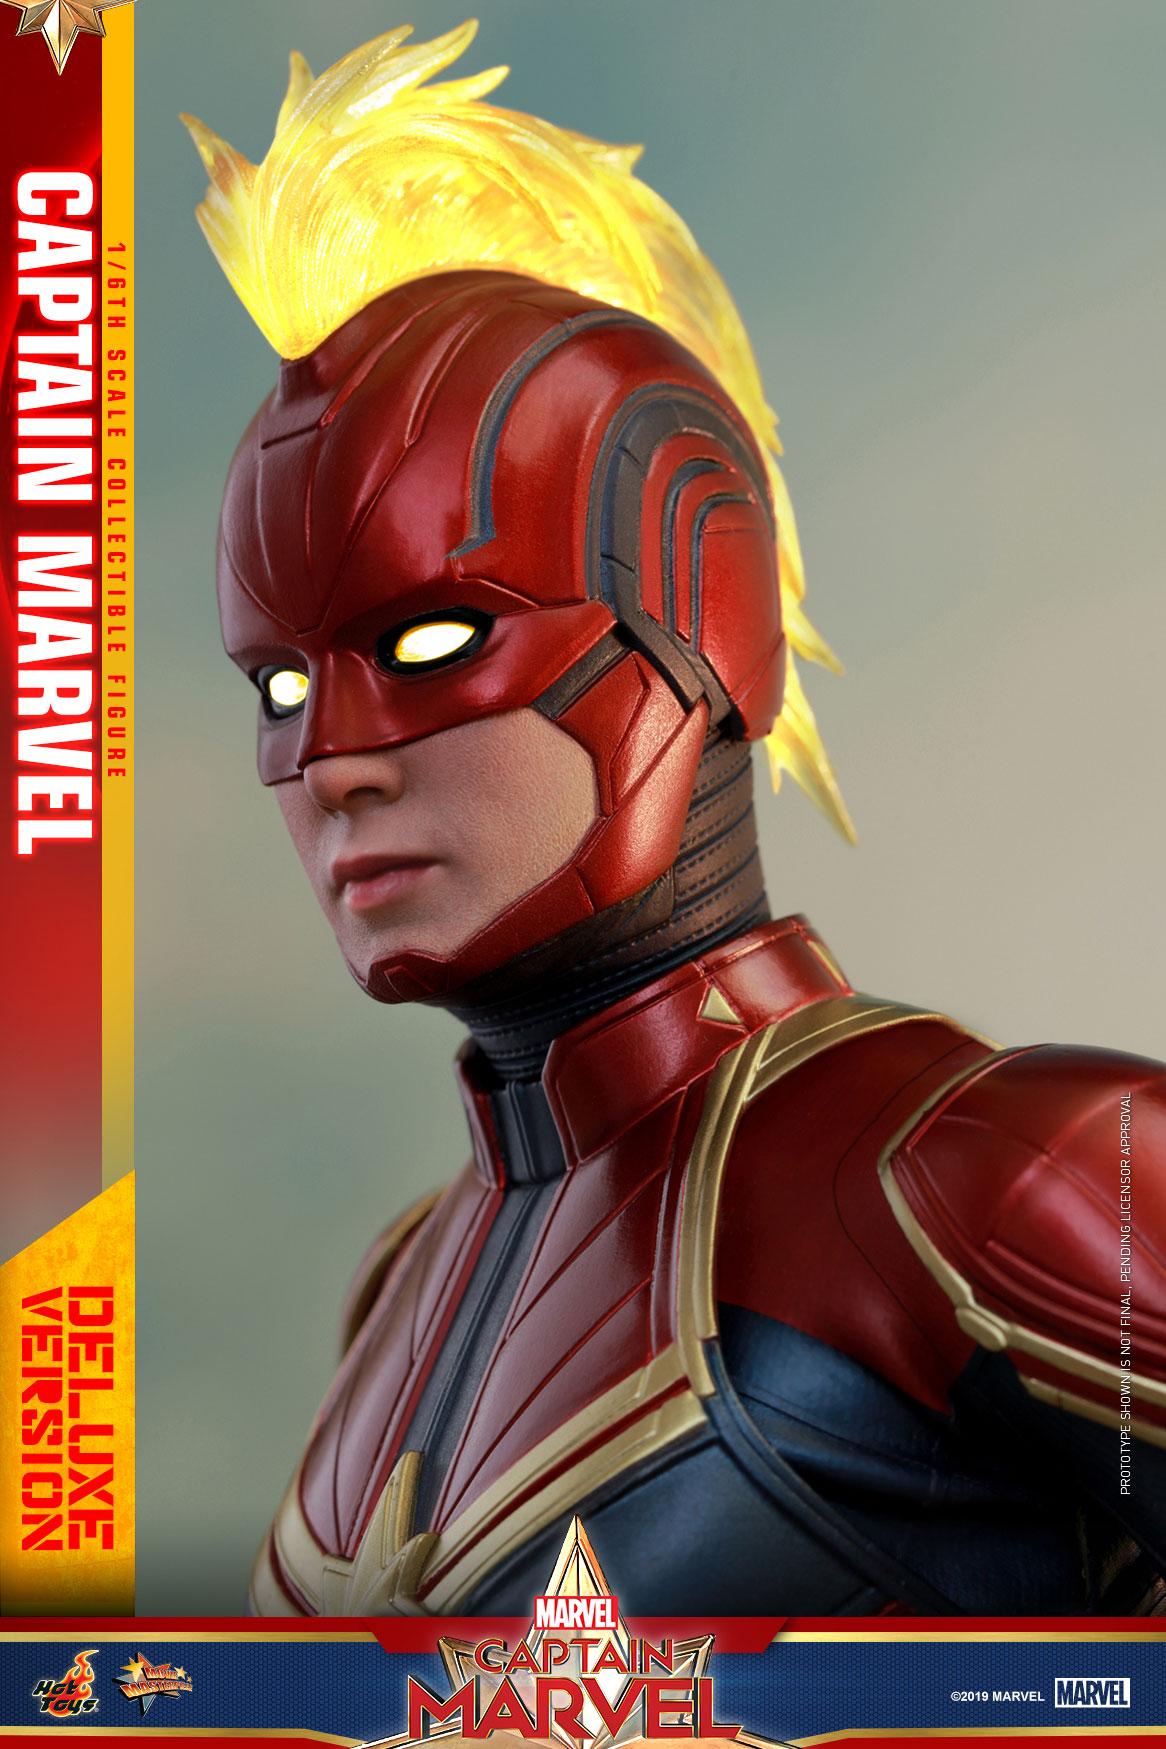 Hot-Toys---Captain-Marvel---Captain-Marvel-collectible-figure-(Deluxe)_PR14